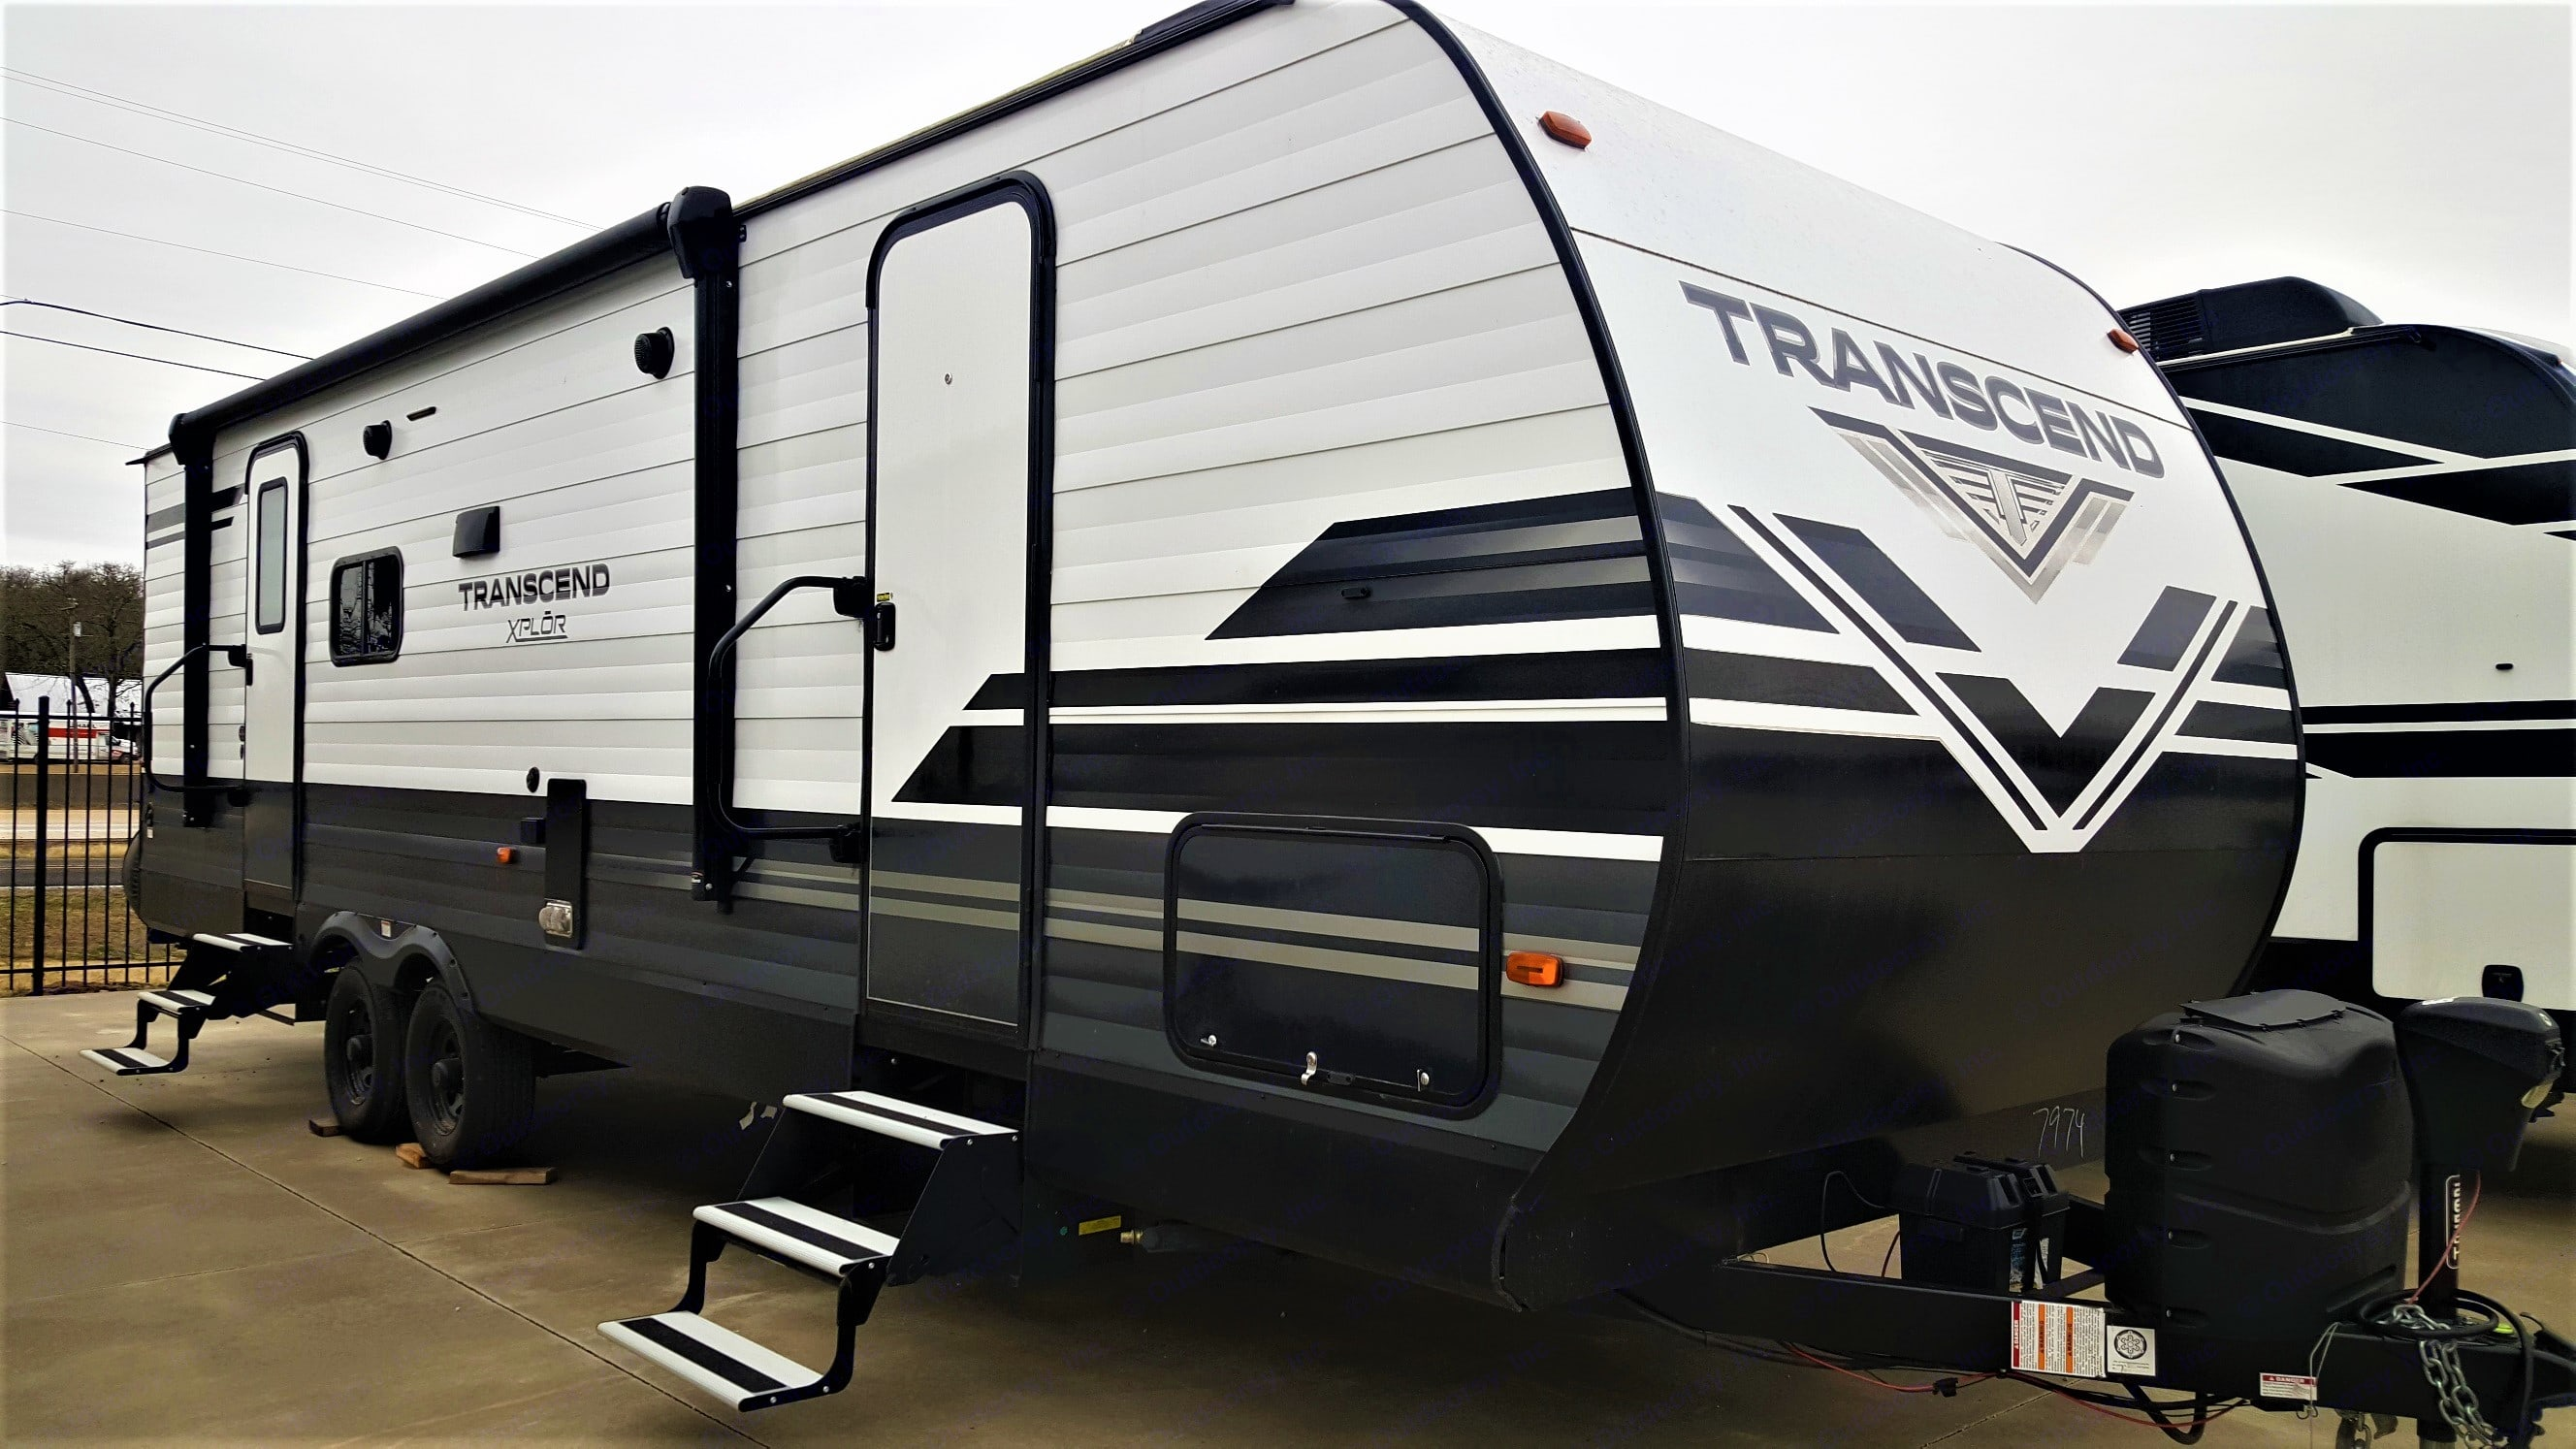 Grand Design Transcend Xplor 265BH 2020